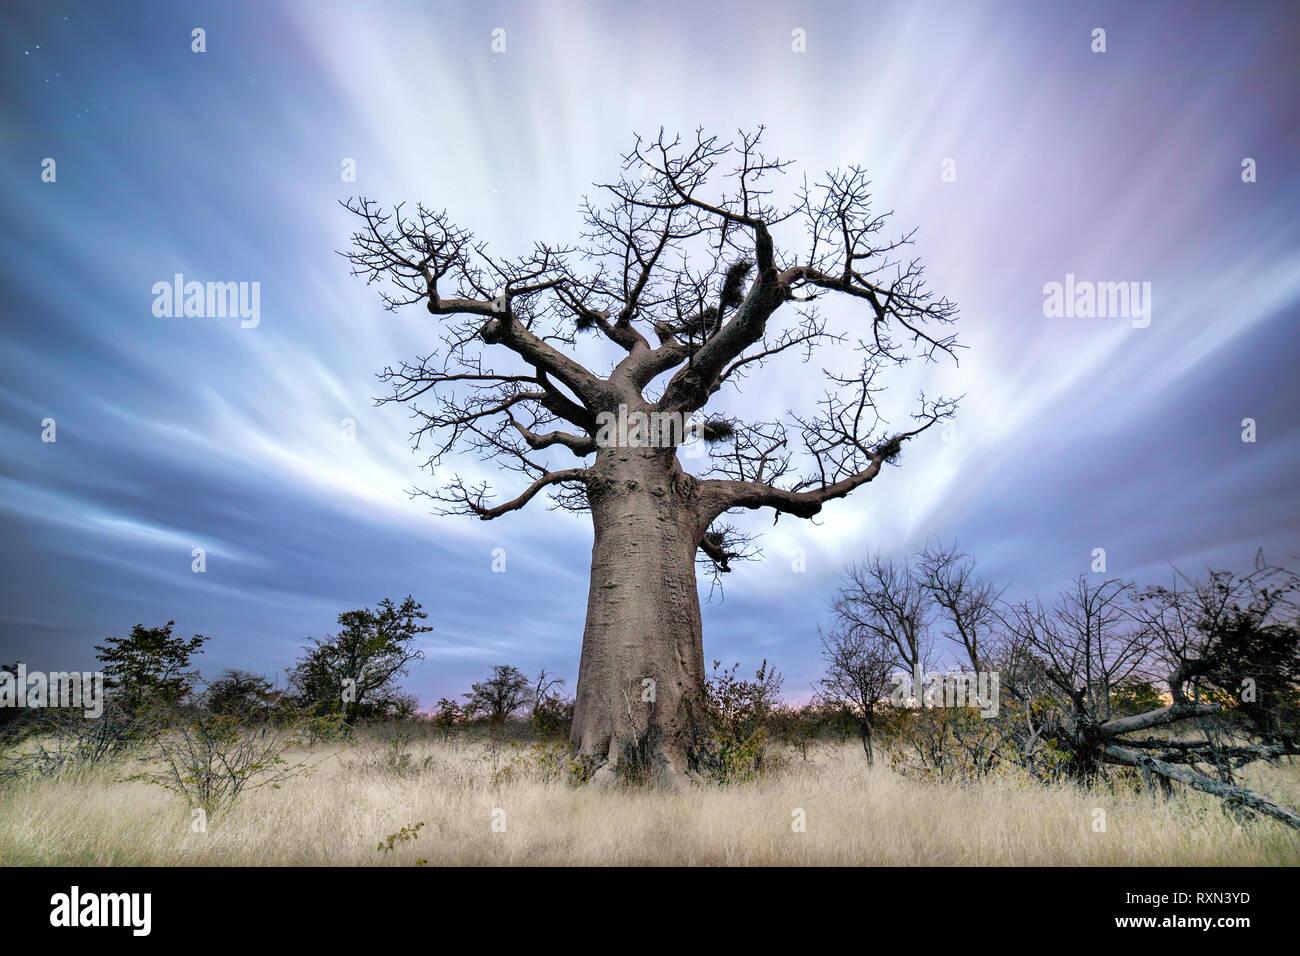 A Baobab tree at Dusk in Botswana. - Stock Image